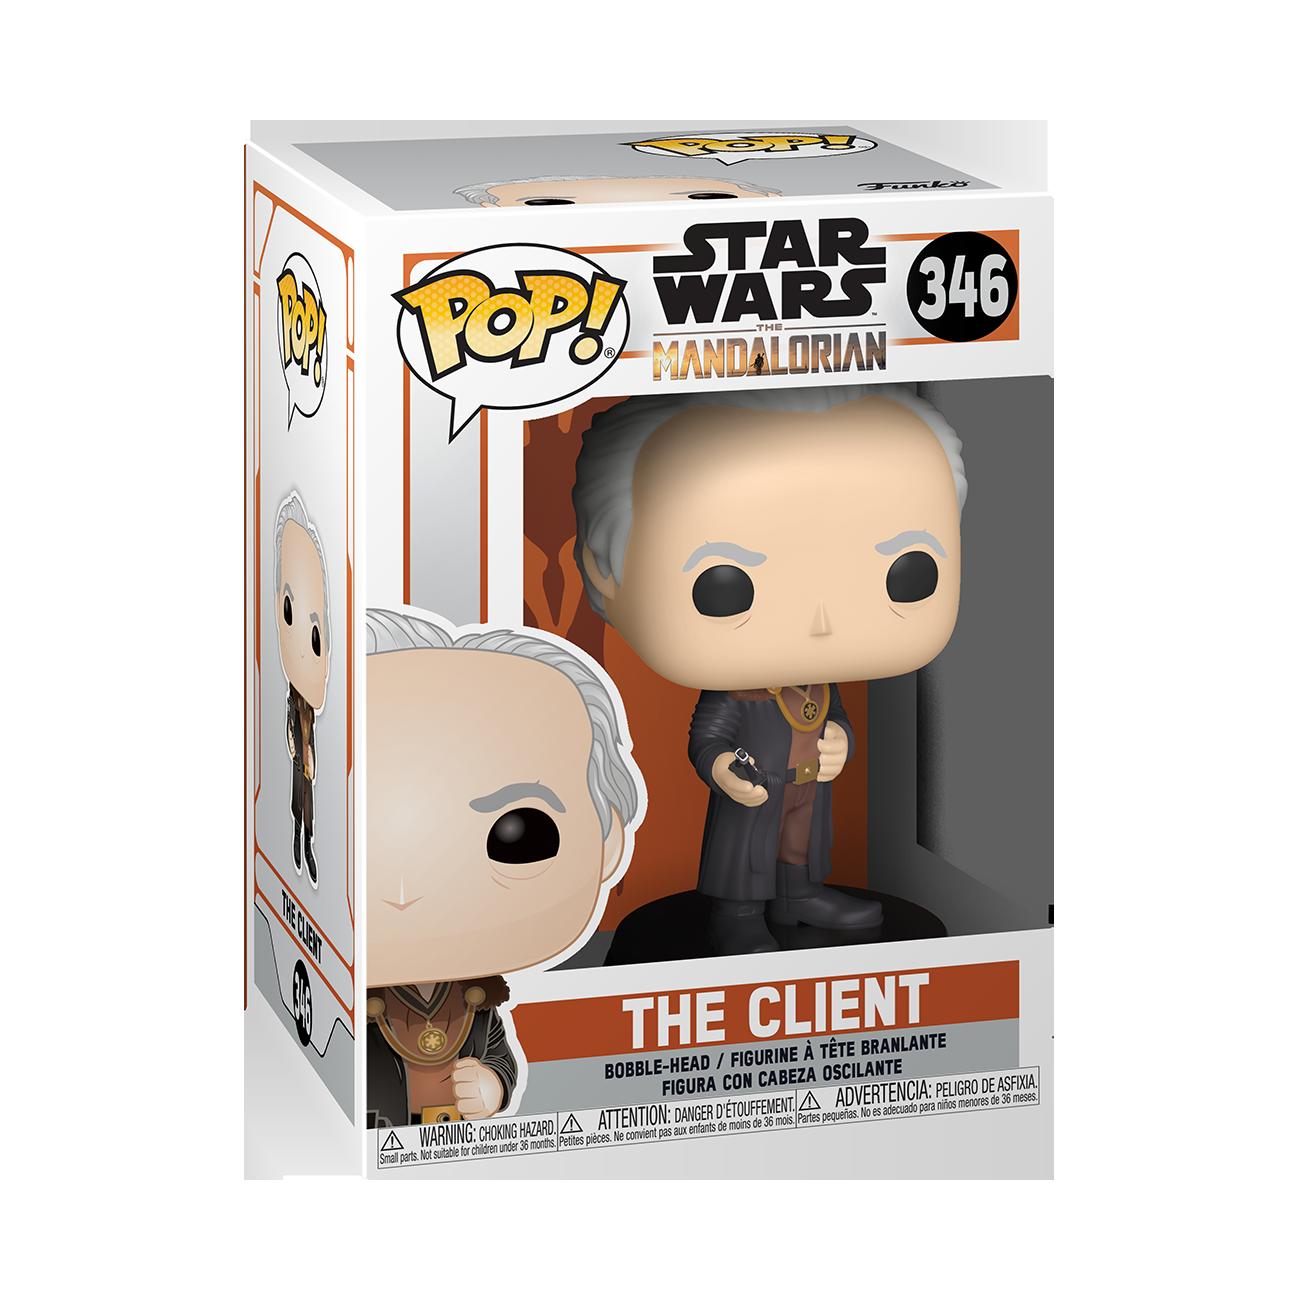 TM The Client FP BH Toy 1